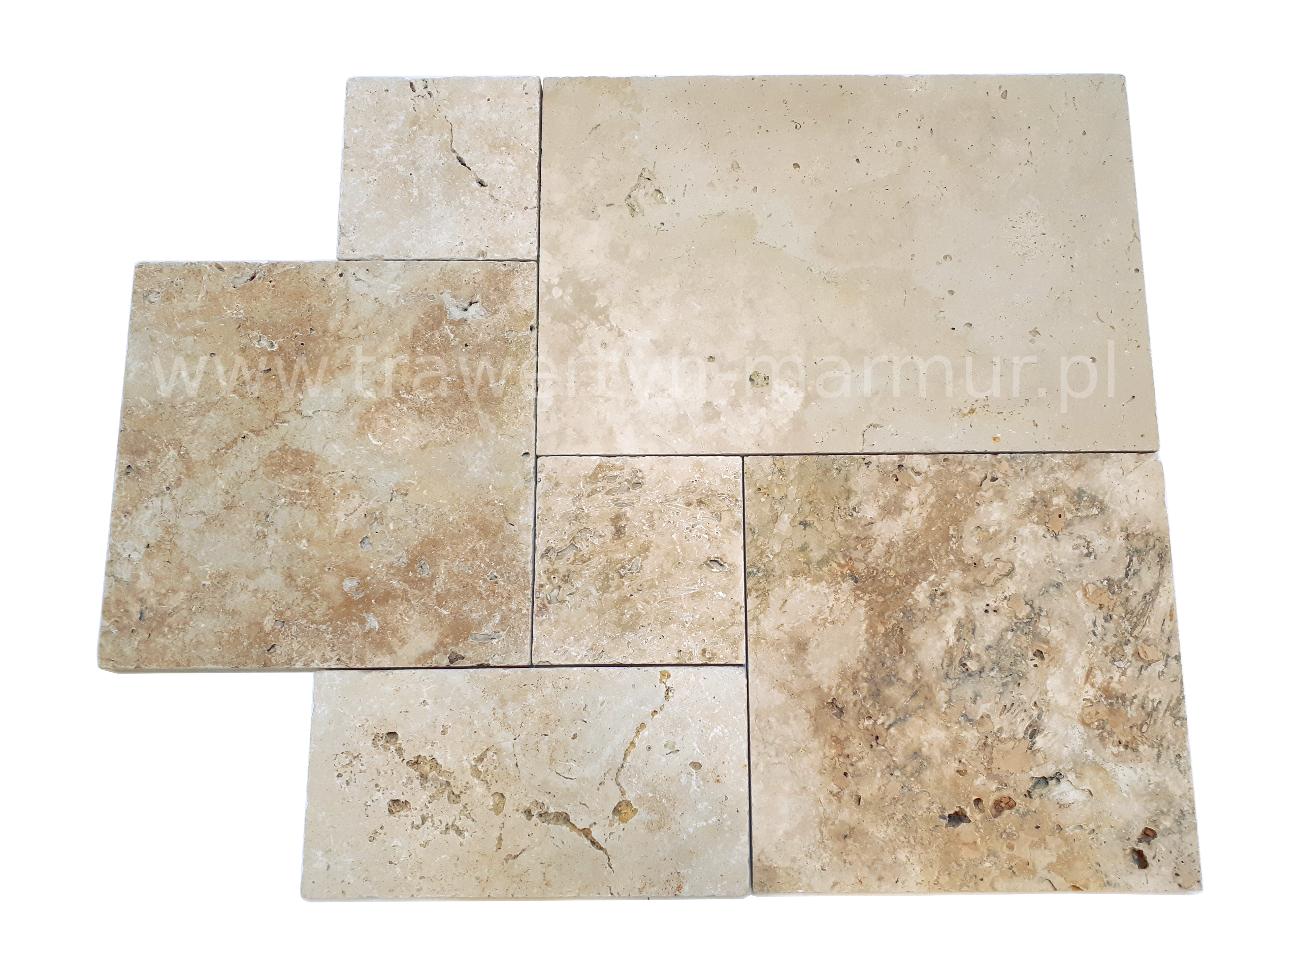 Trawertyn płyty tarasowe Ivory Tumbled Antique Square Pavio 3cm